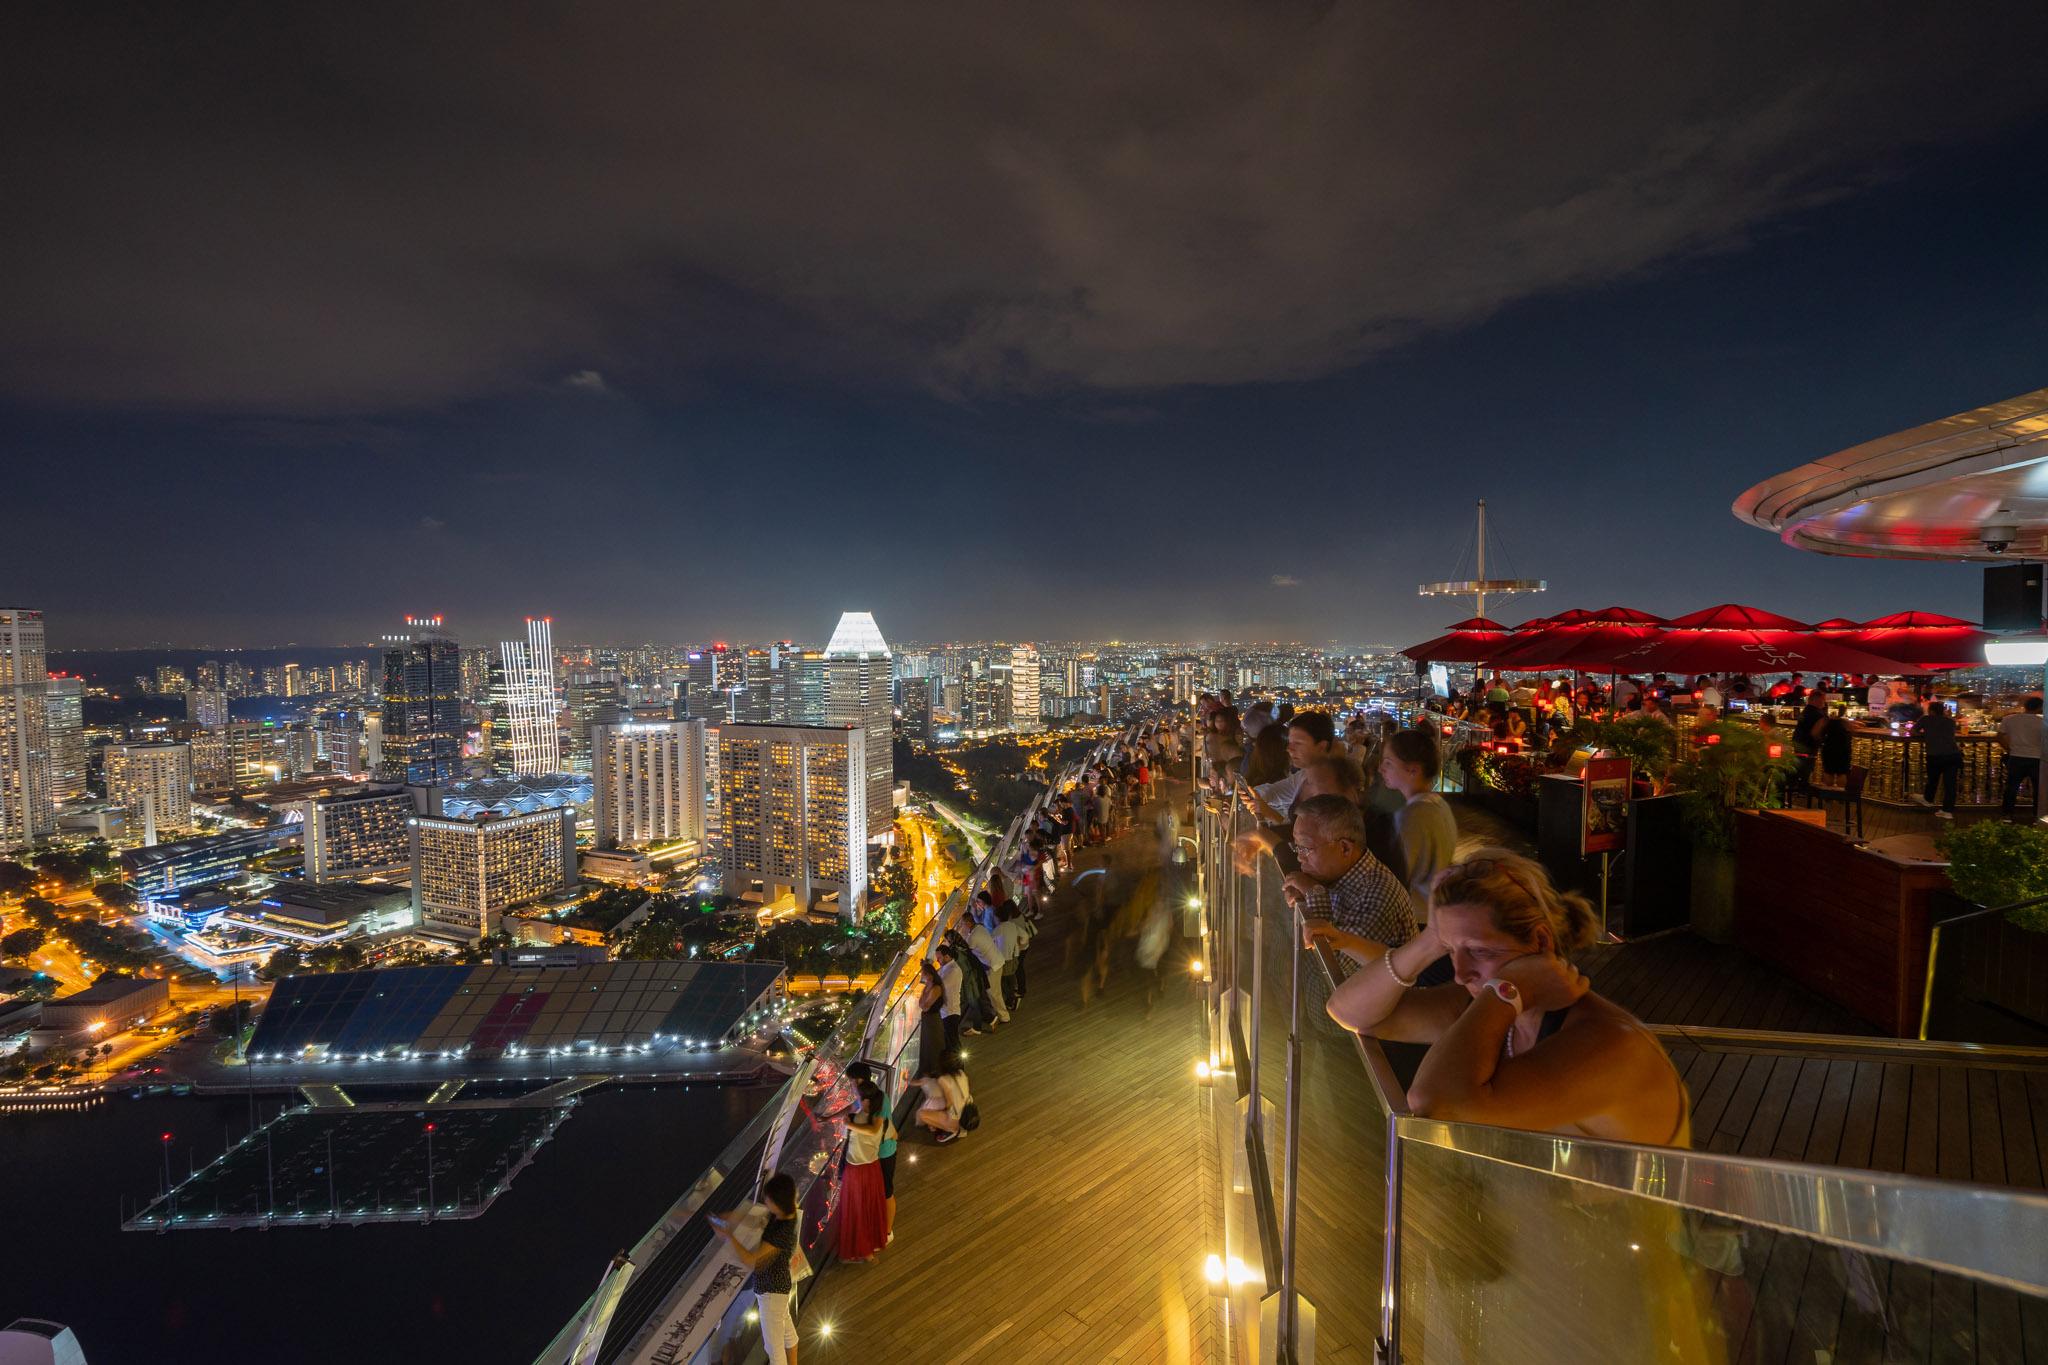 viator-singapore-photographer-tourism-tours-zoo-little-india-gardens-marina-bay-020.jpg